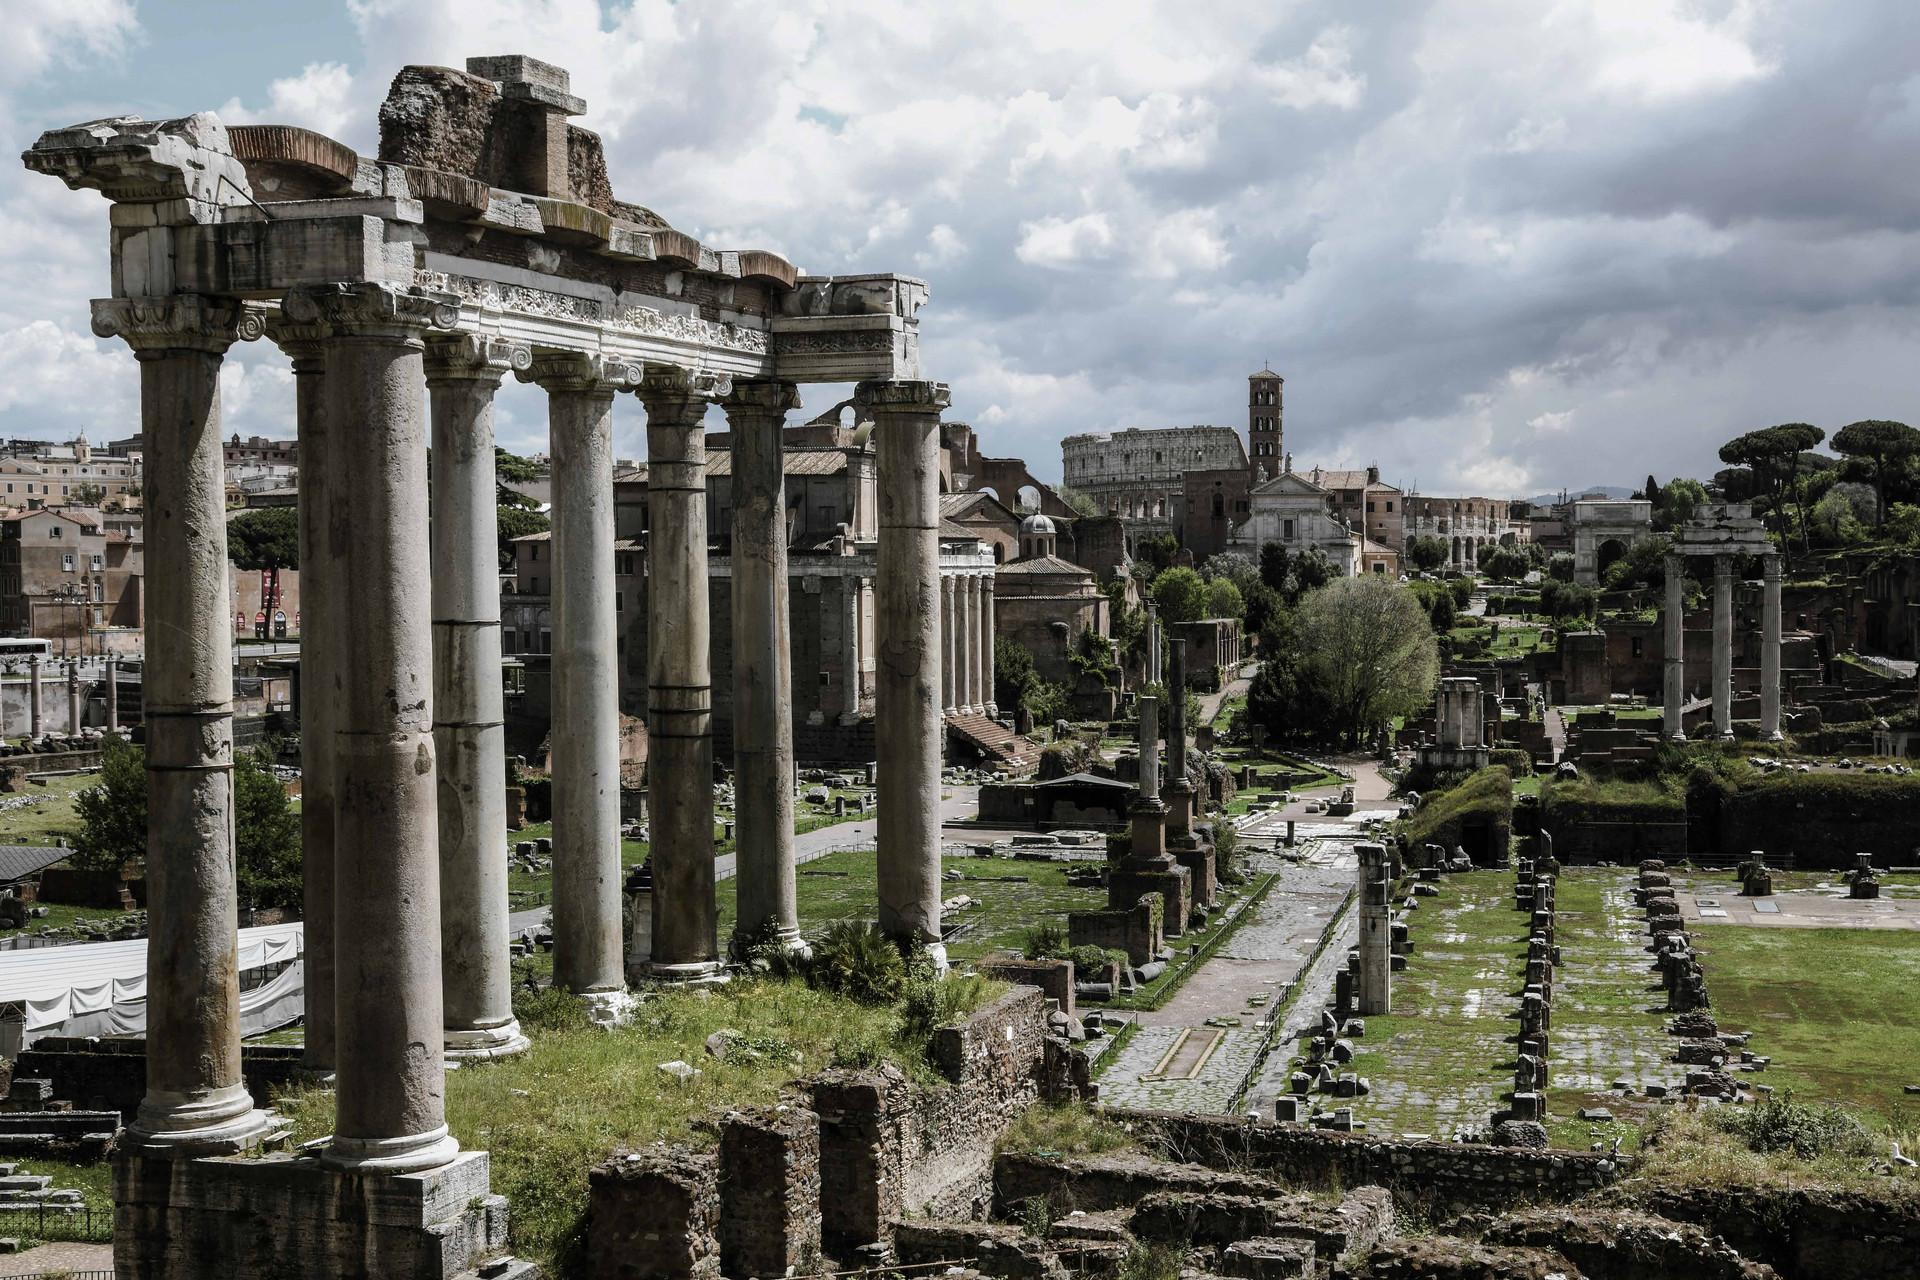 The Roman Forums - Fori Romani